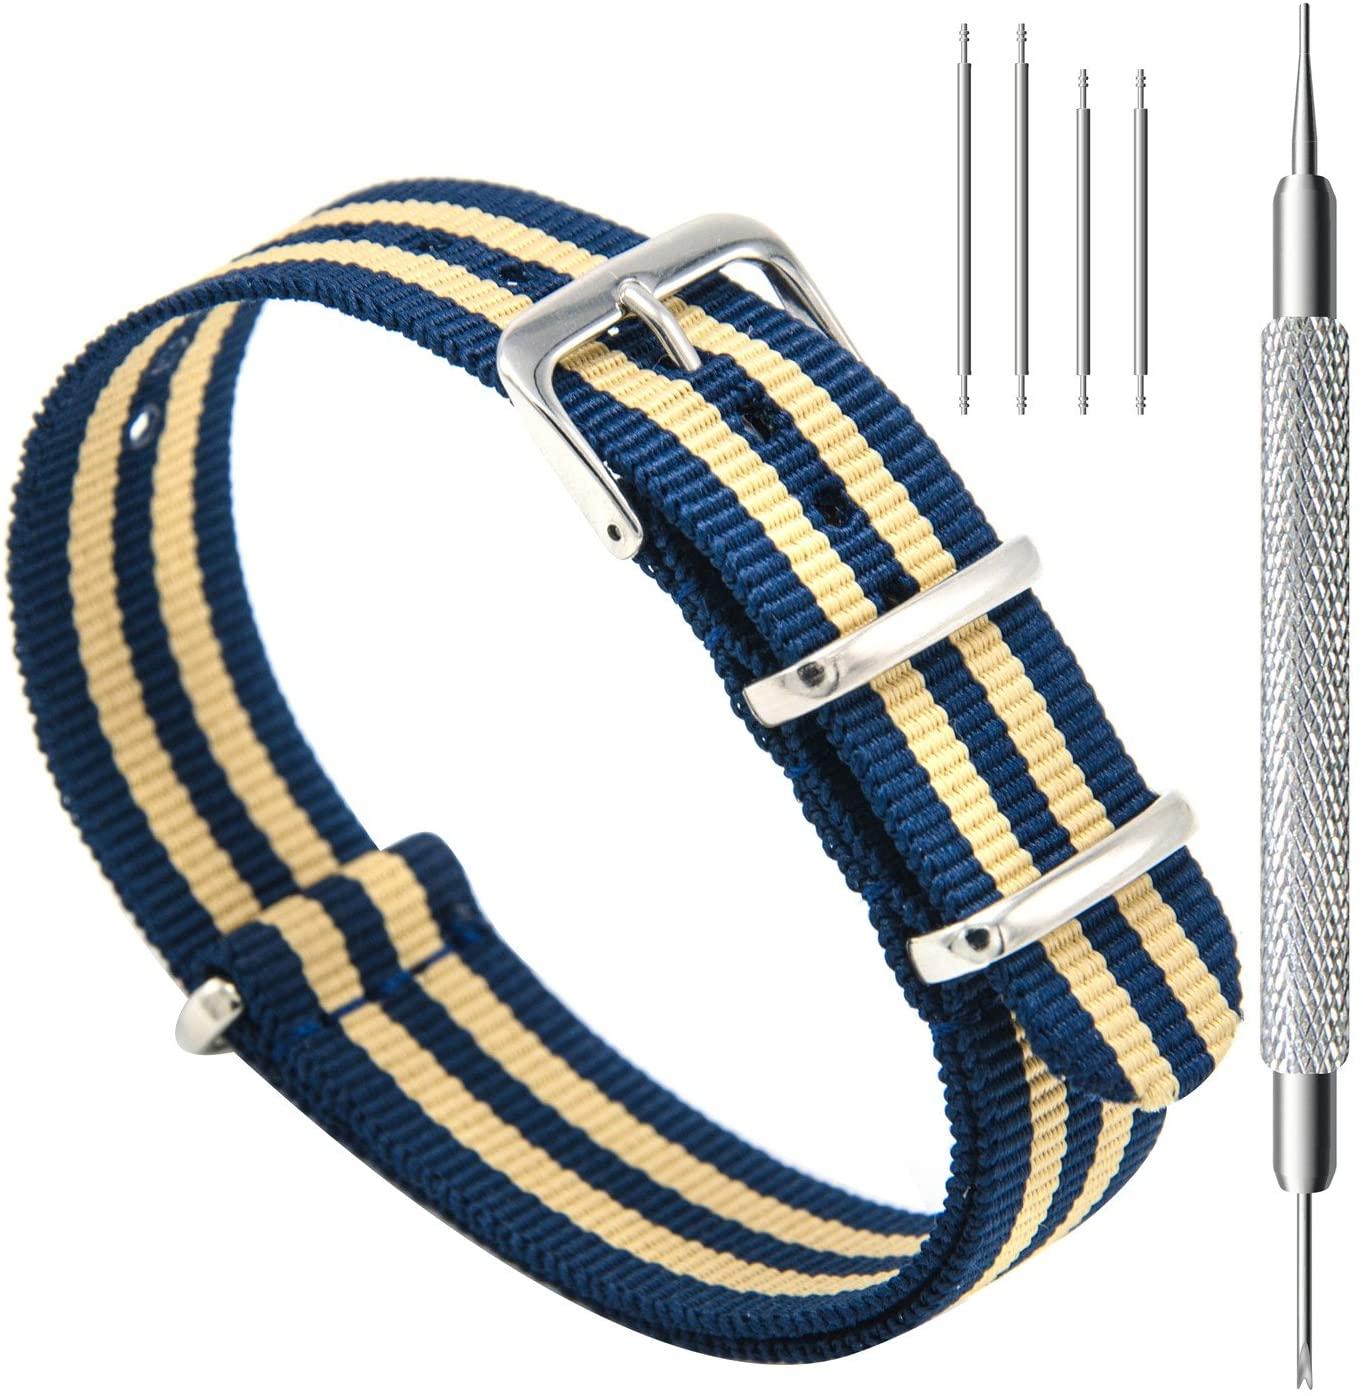 CIVO Watch Bands NATO Premium Ballistic Nylon Watch Strap Stainless Steel Buckle (Navy/Khaki, 18mm)